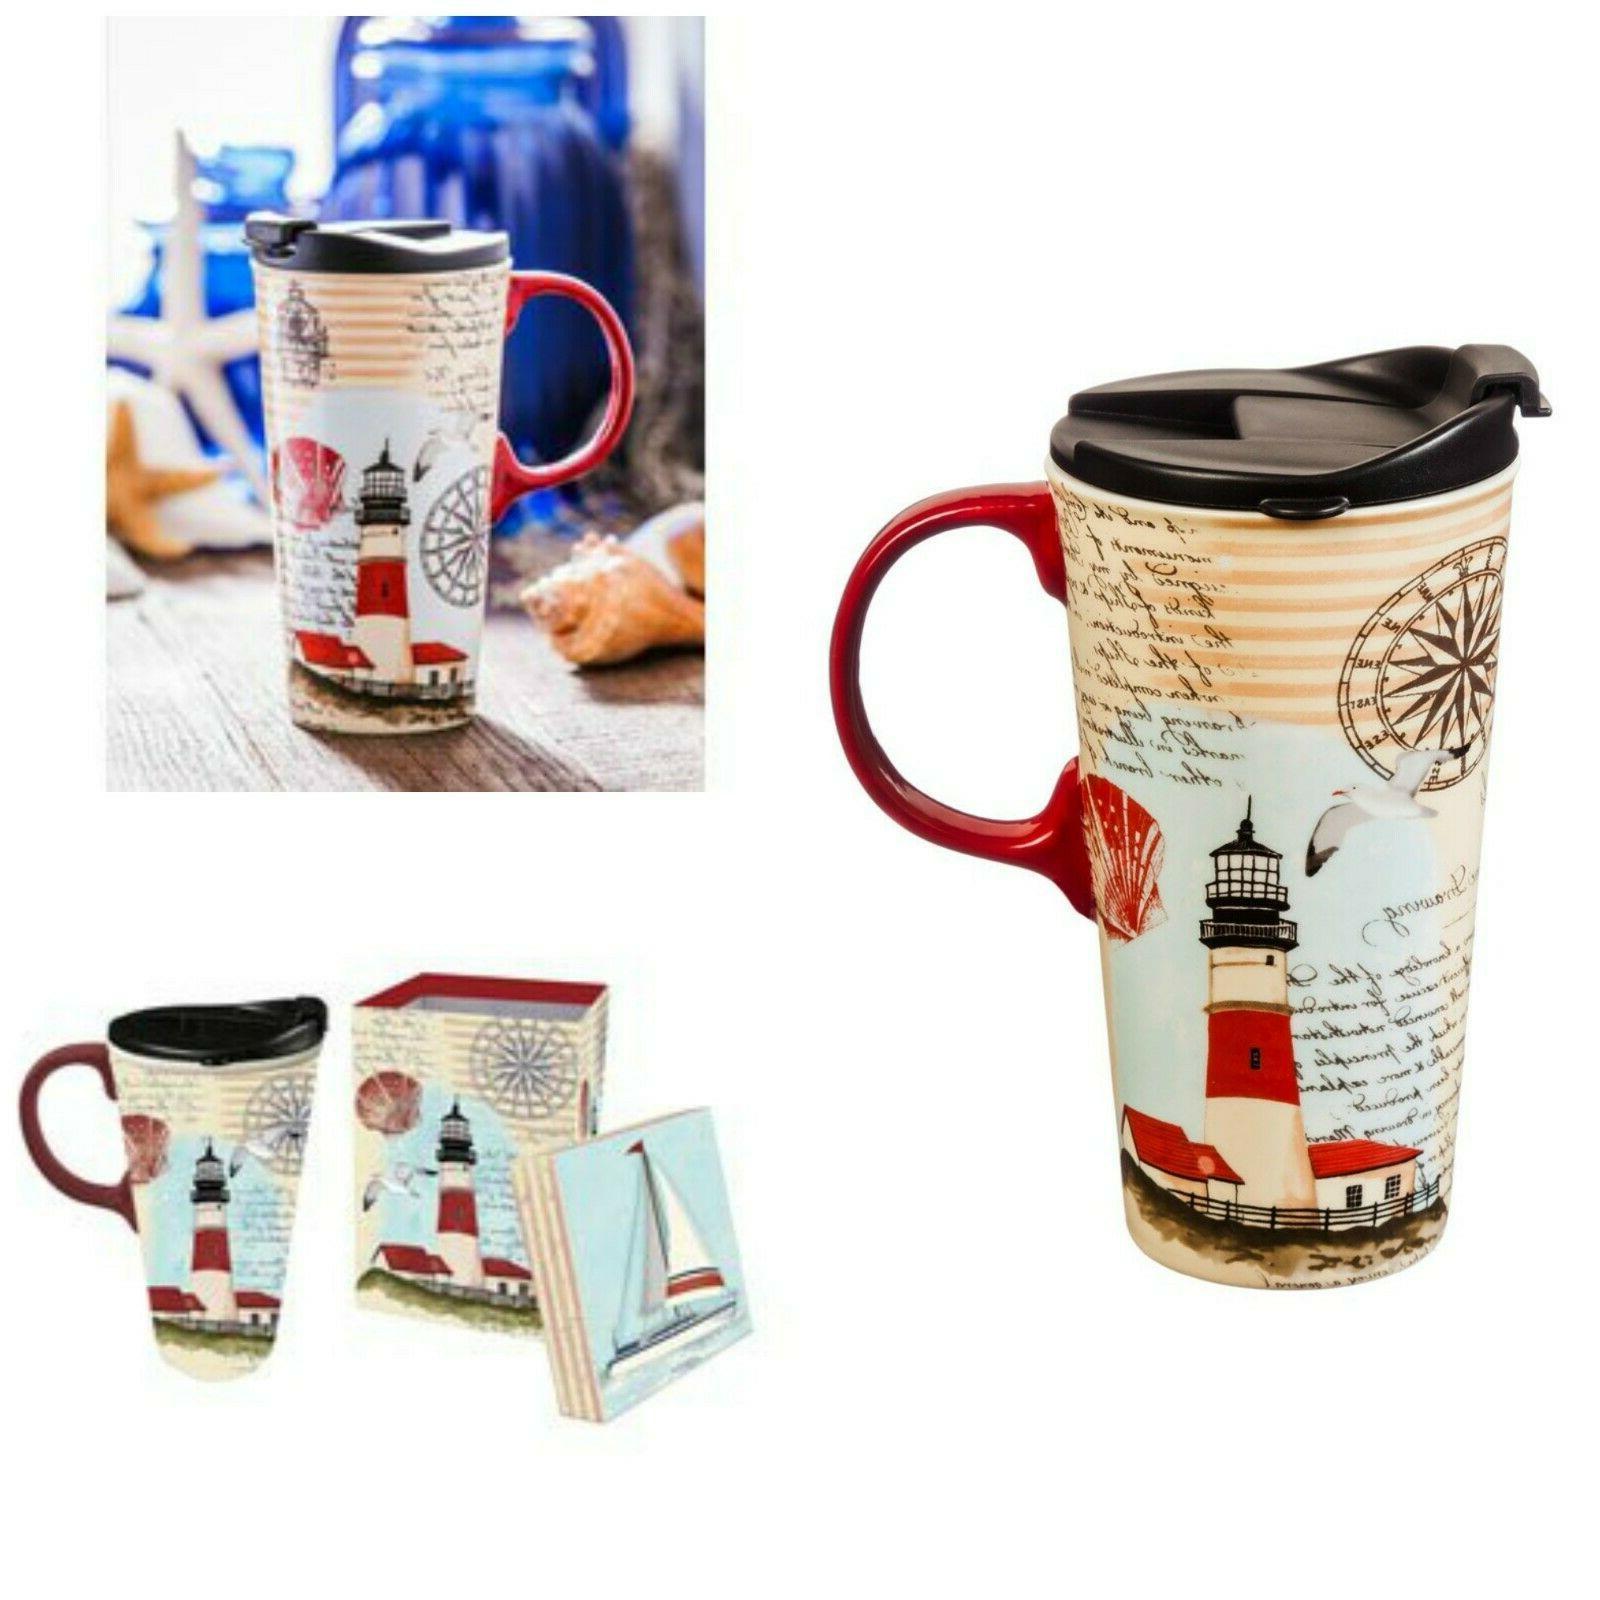 Microwave Safe Travel Mug Gift Box Plastic Lids Dishwasher T